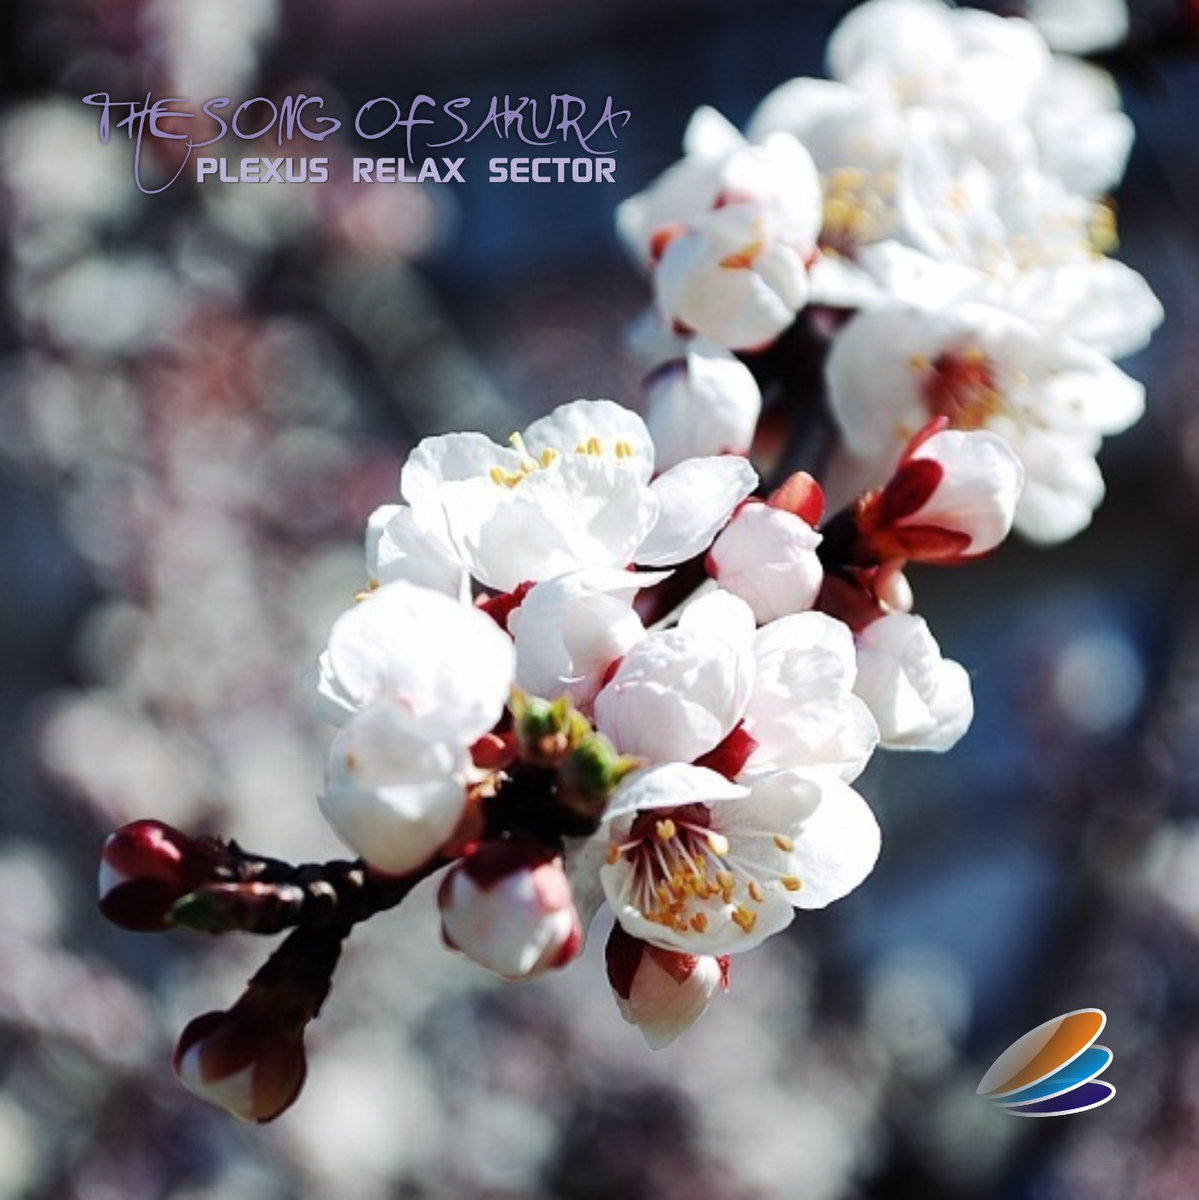 Plexus Relax Sector - The Song Of Sakura